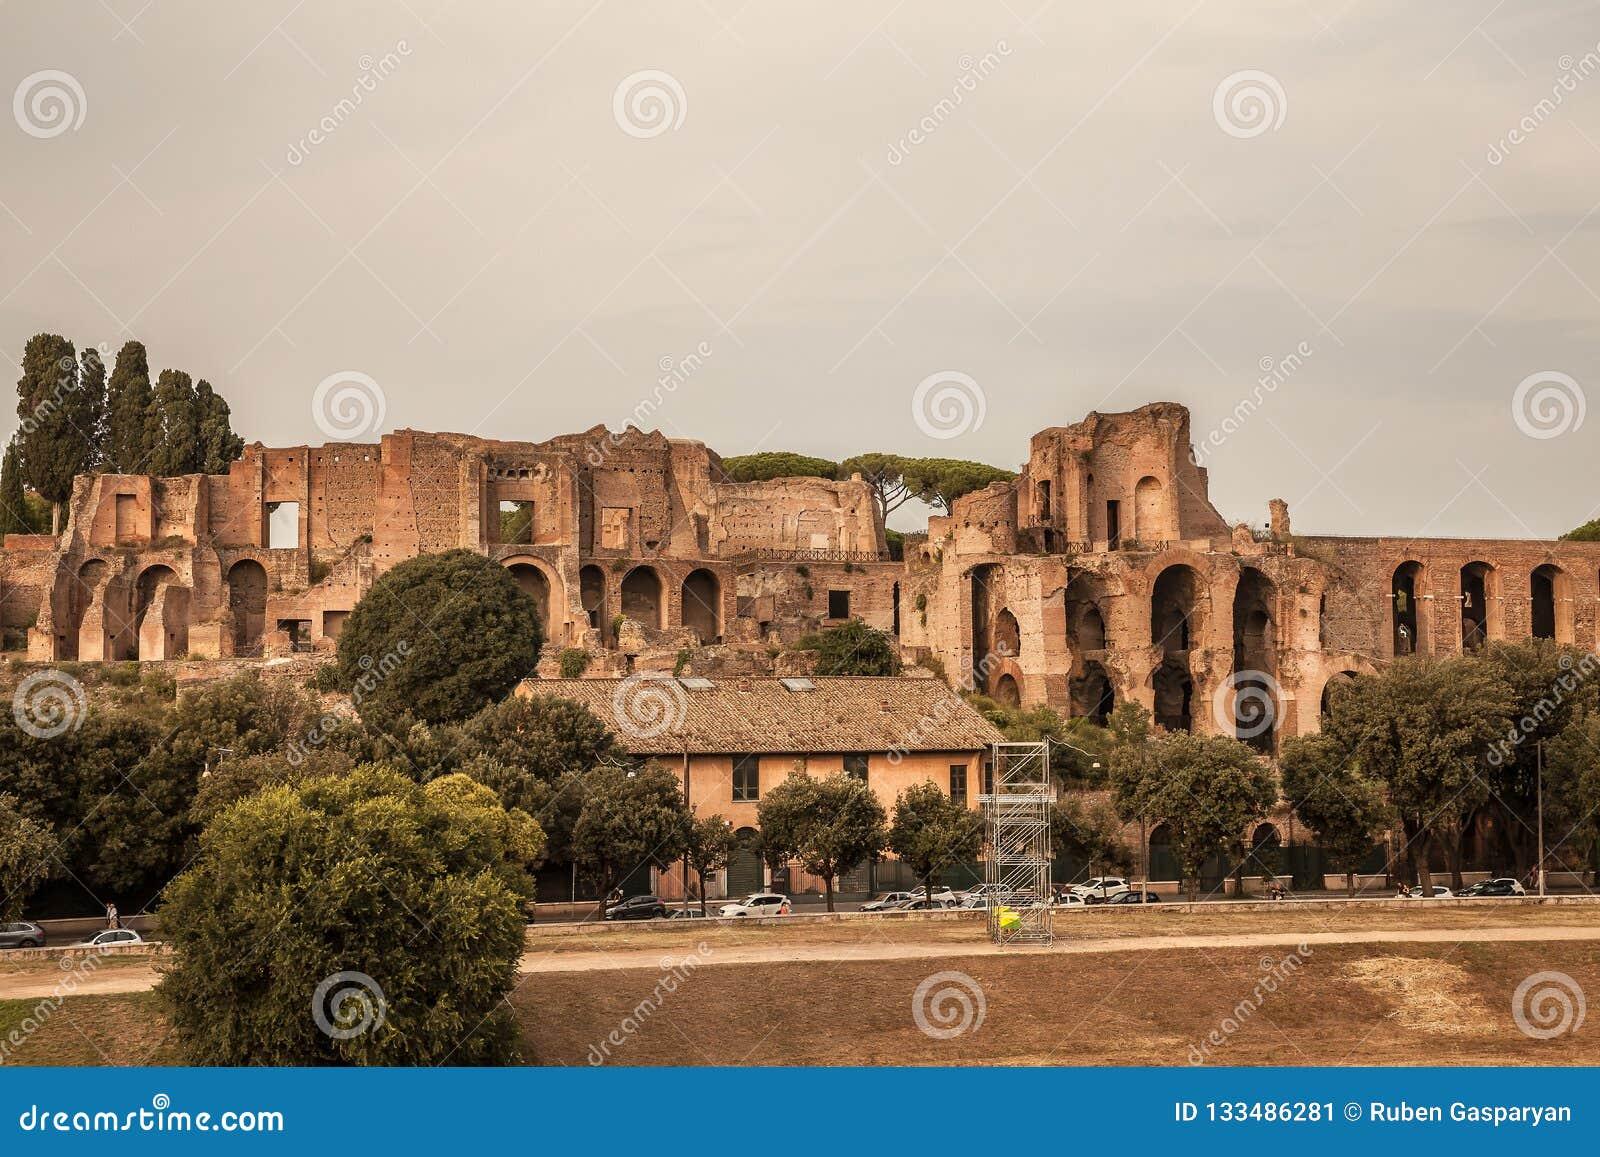 Ruins of Circus Maximus in Rome, Italy